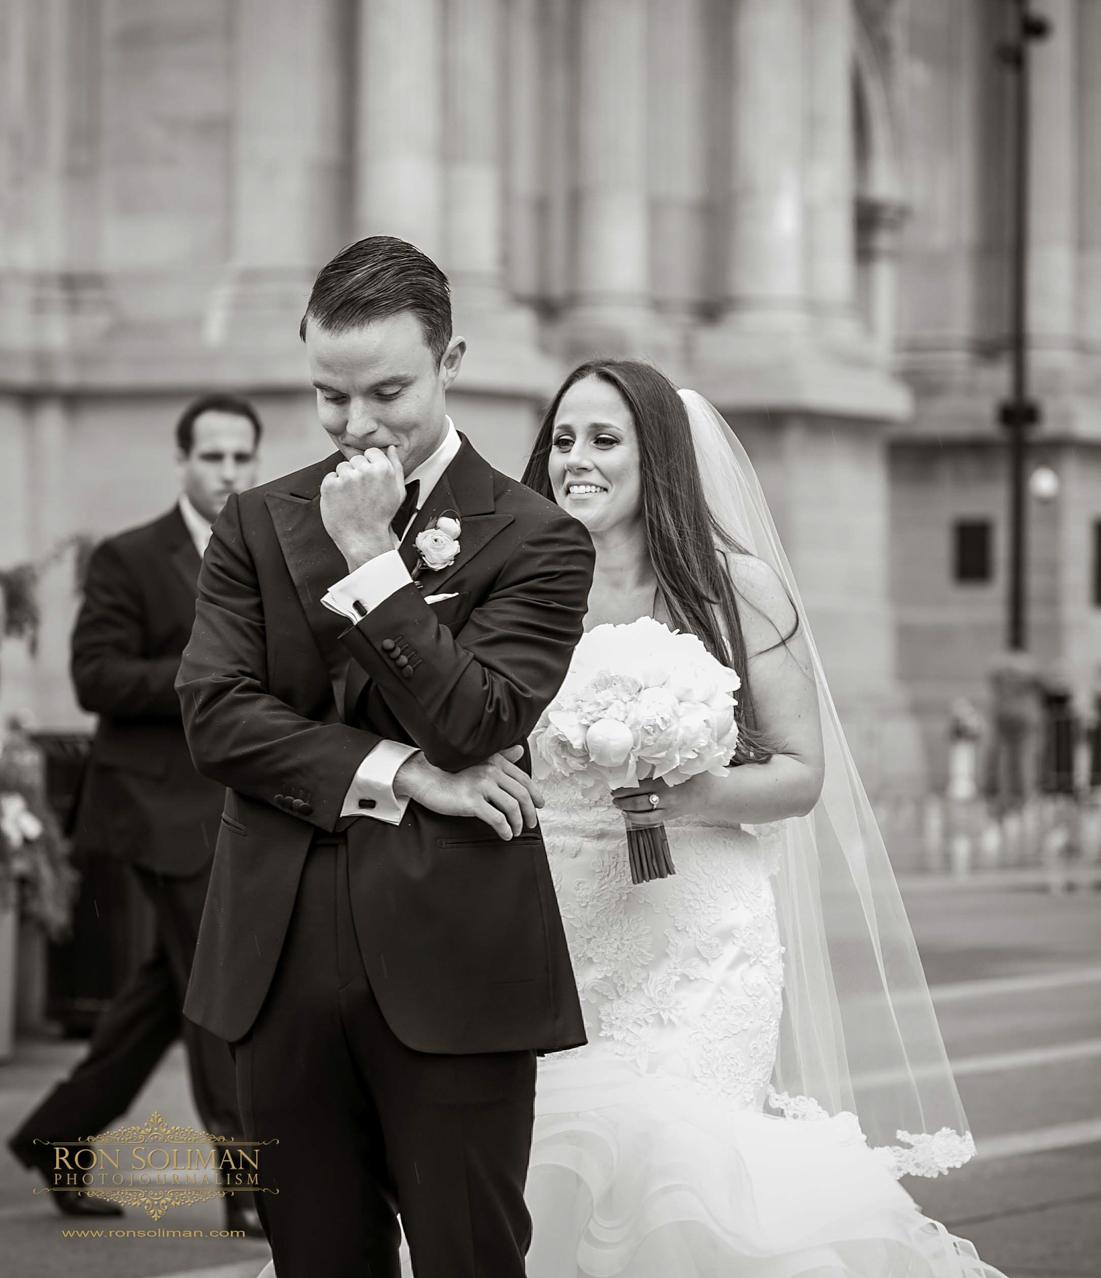 UNION TRUST WEDDING 017